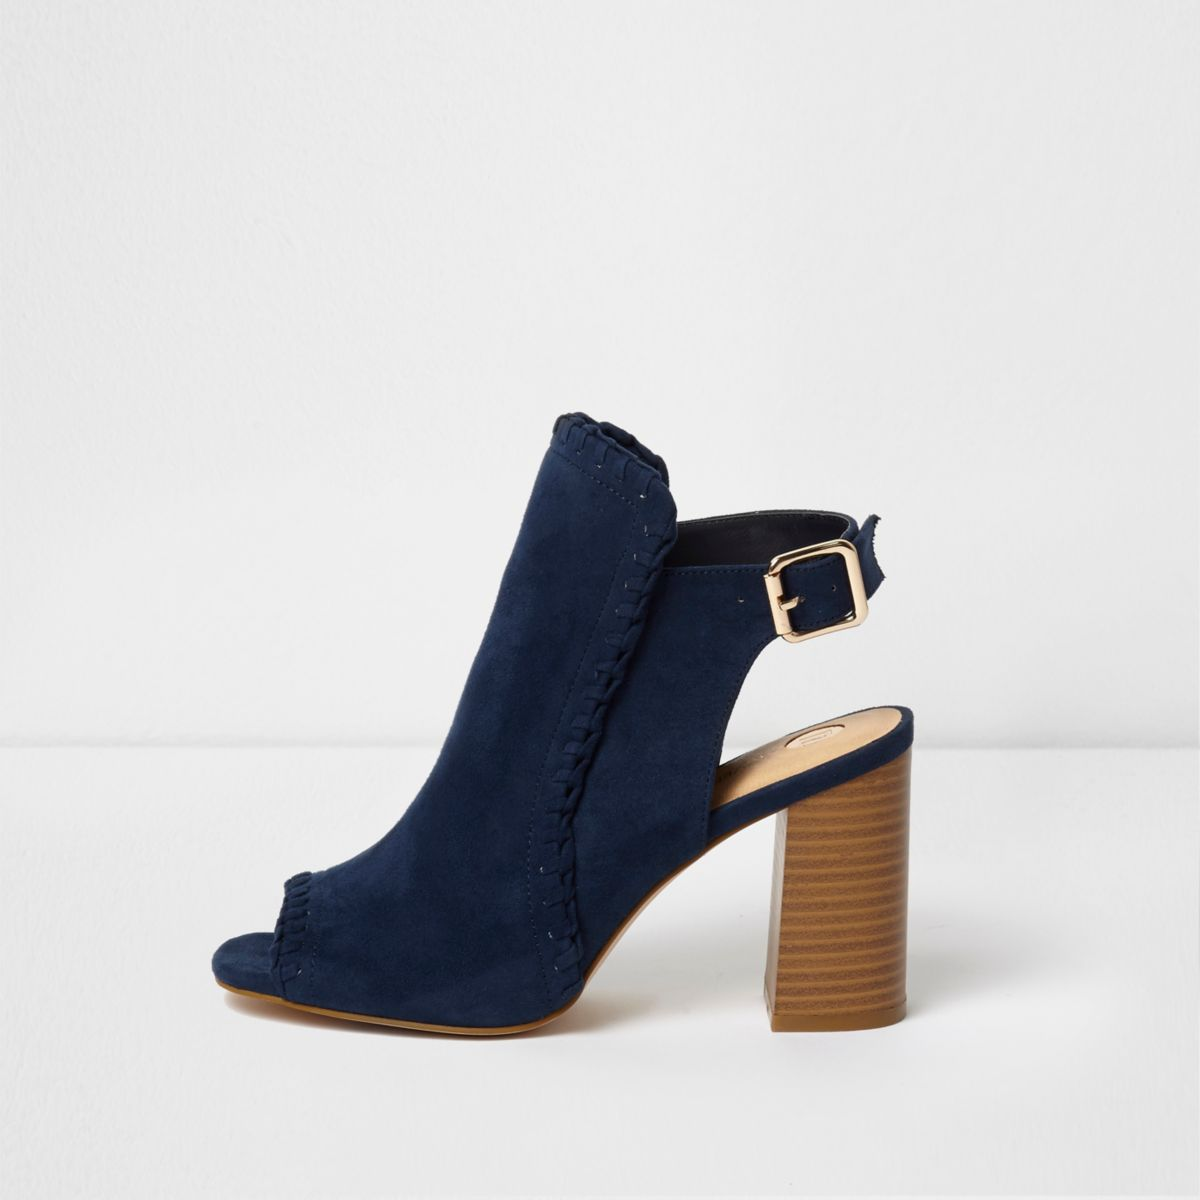 Blue peep toe block heel shoe boots